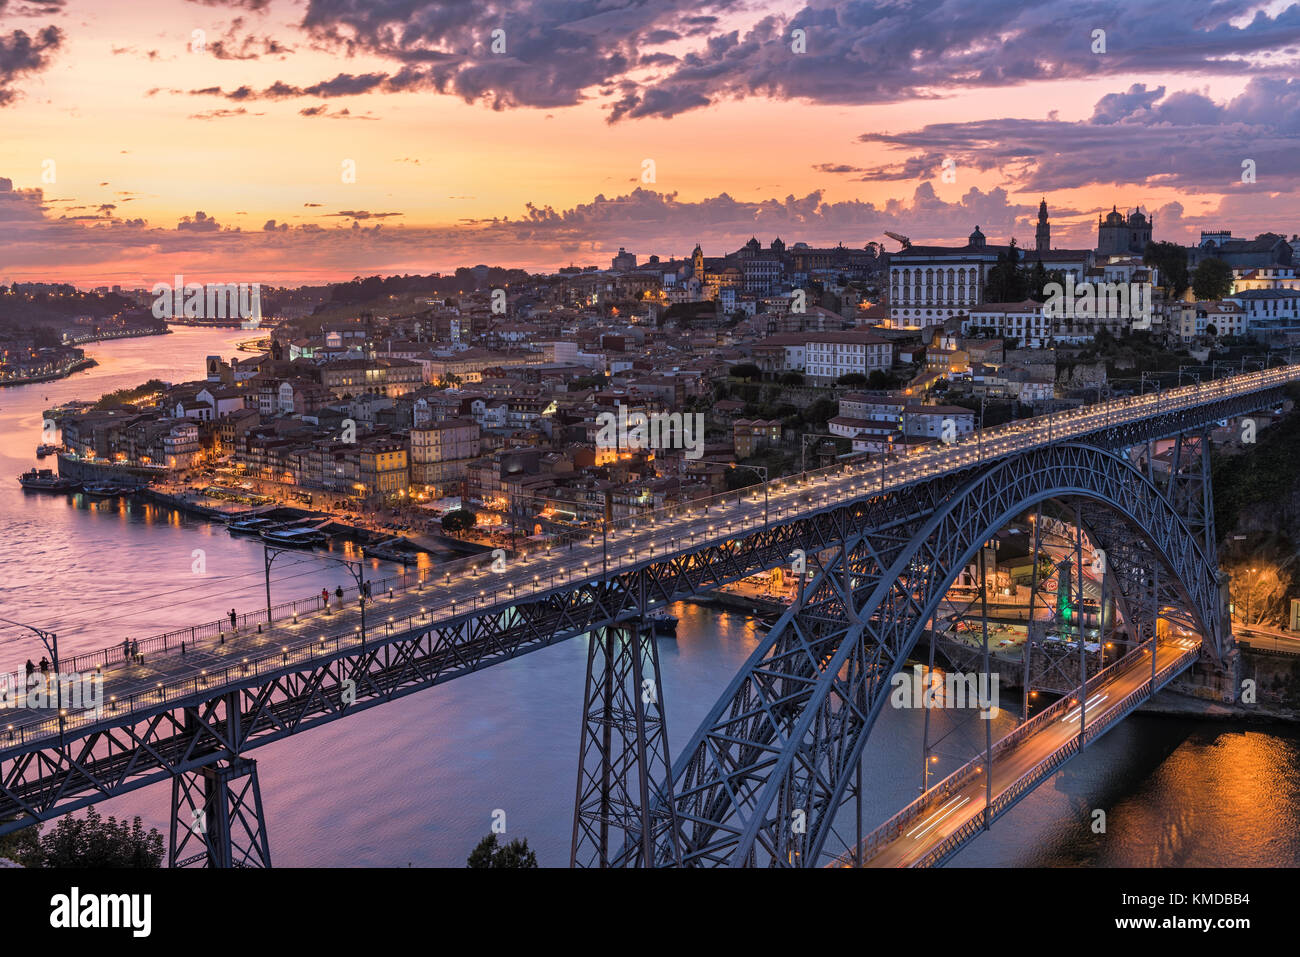 City view and Dom Luis I bridge Porto Portugal - Stock Image